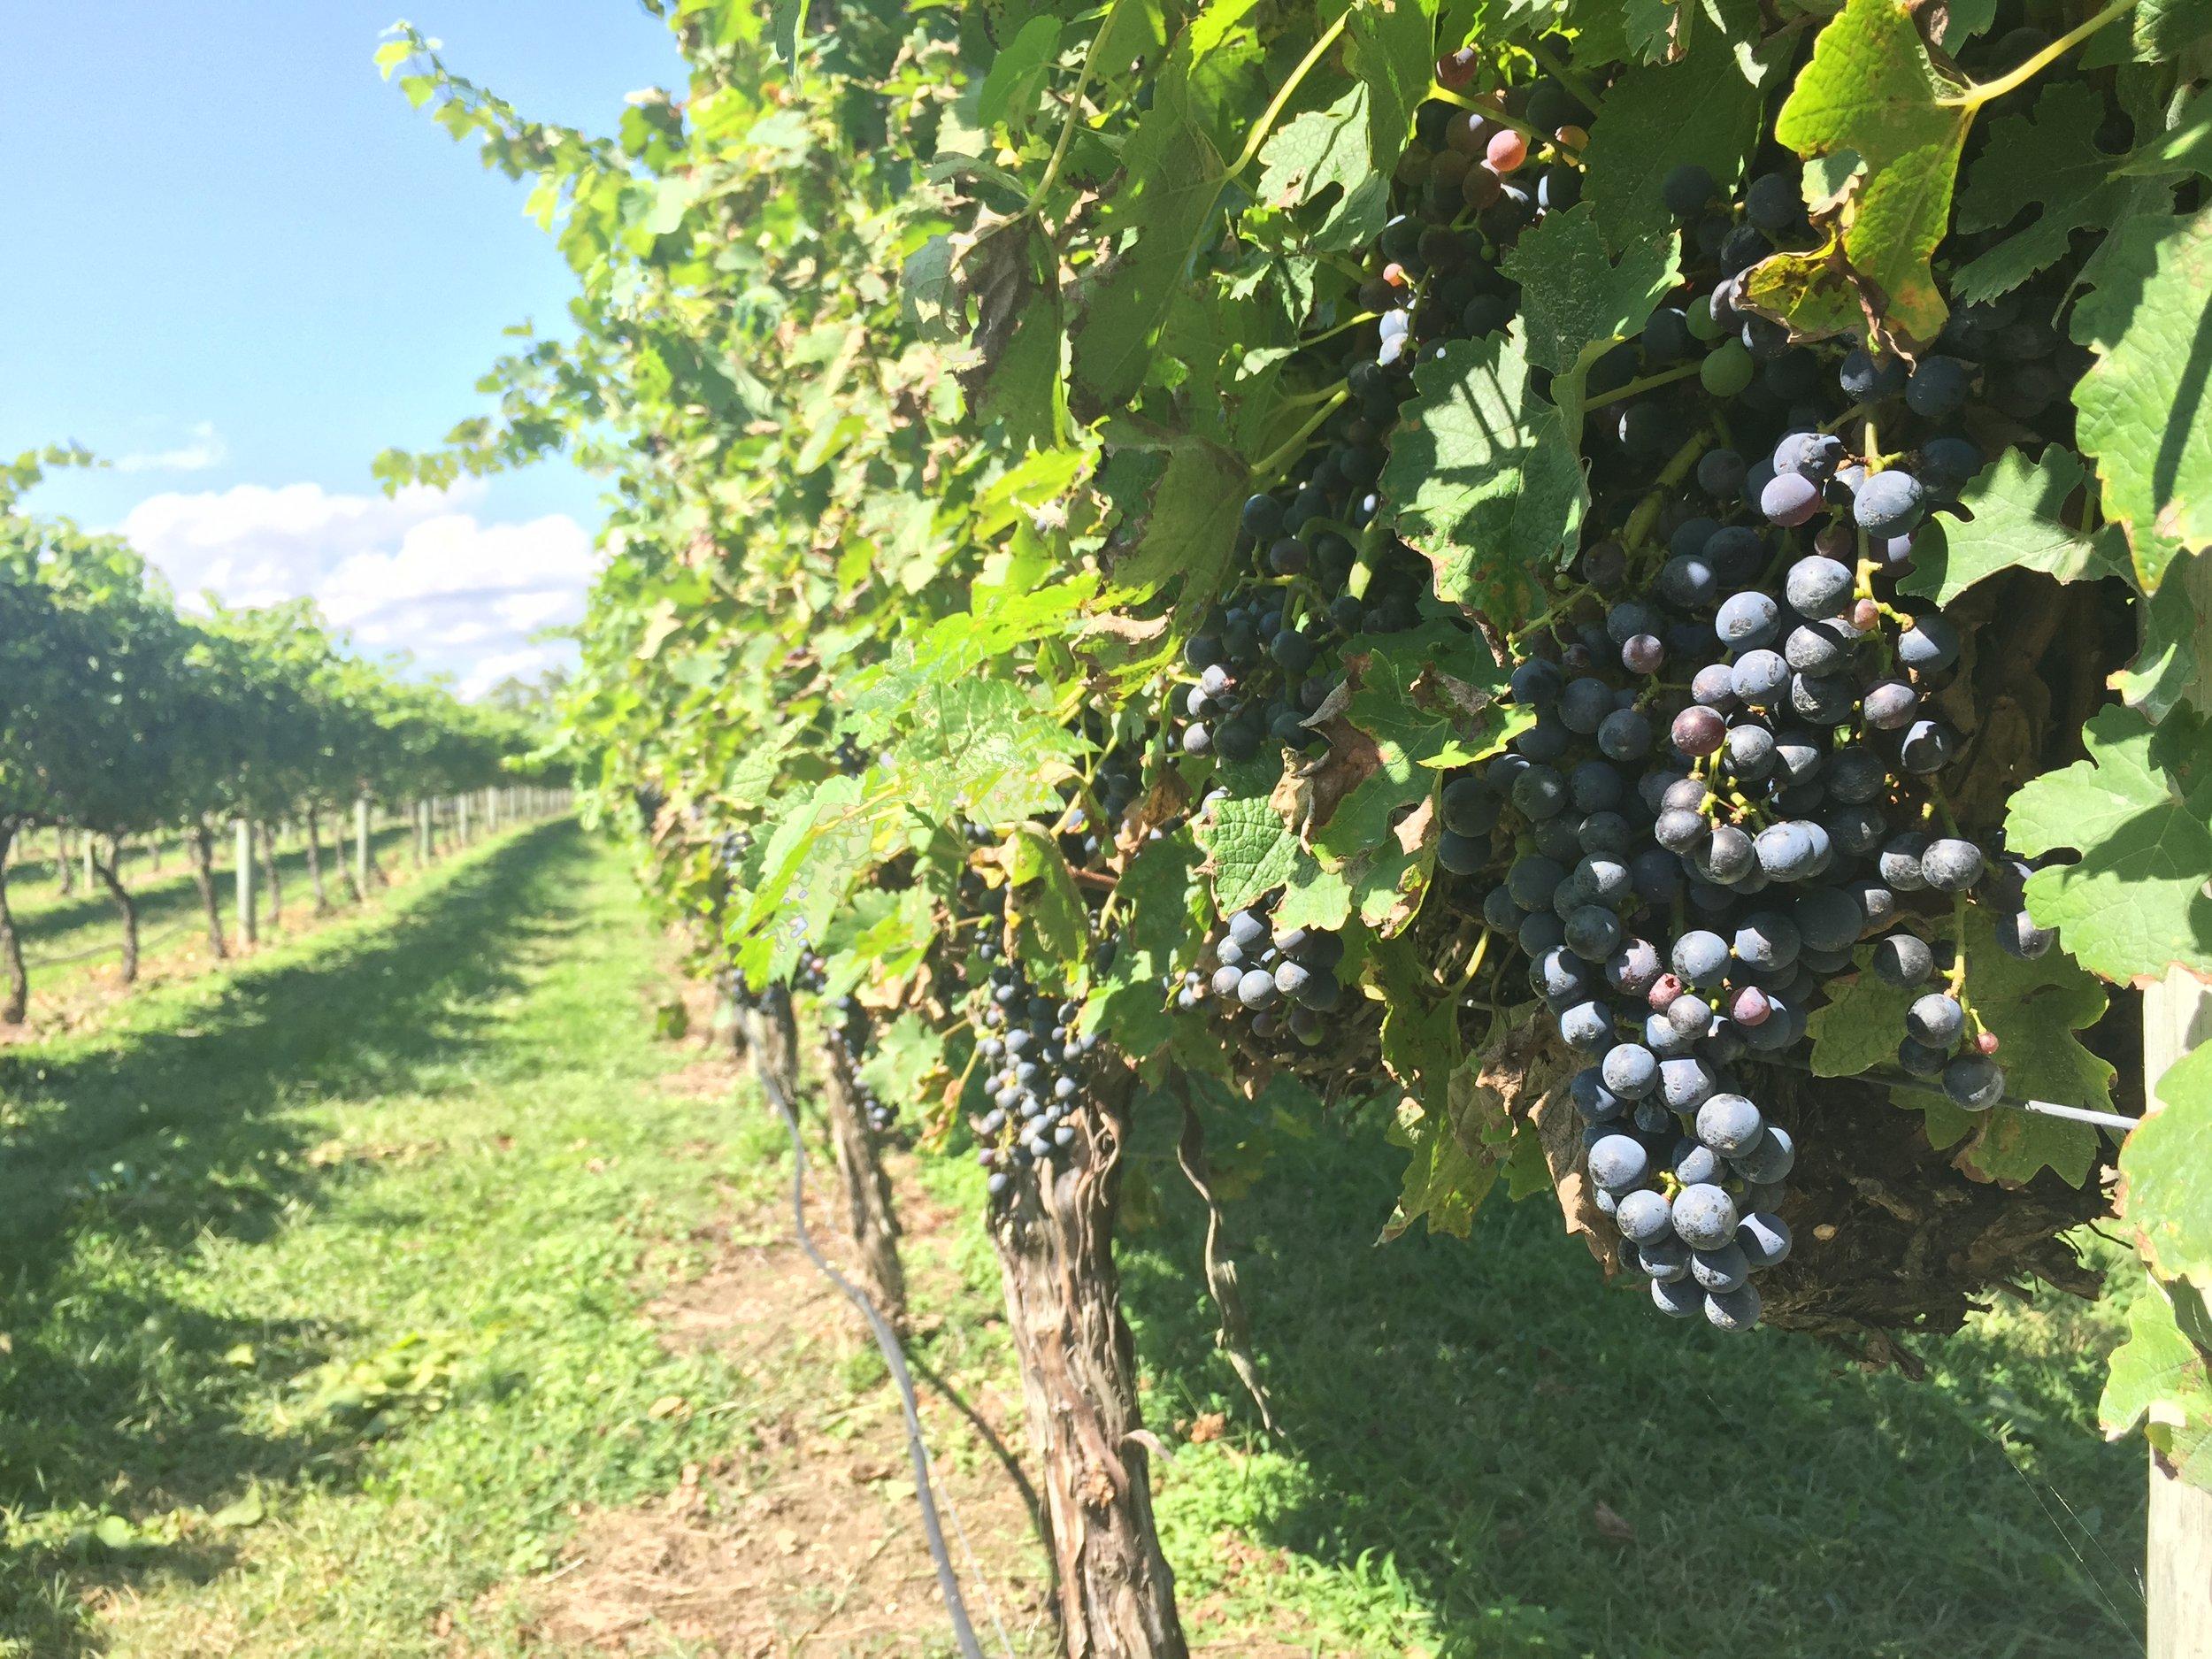 Cape May Vineyards, Cape May, NJ